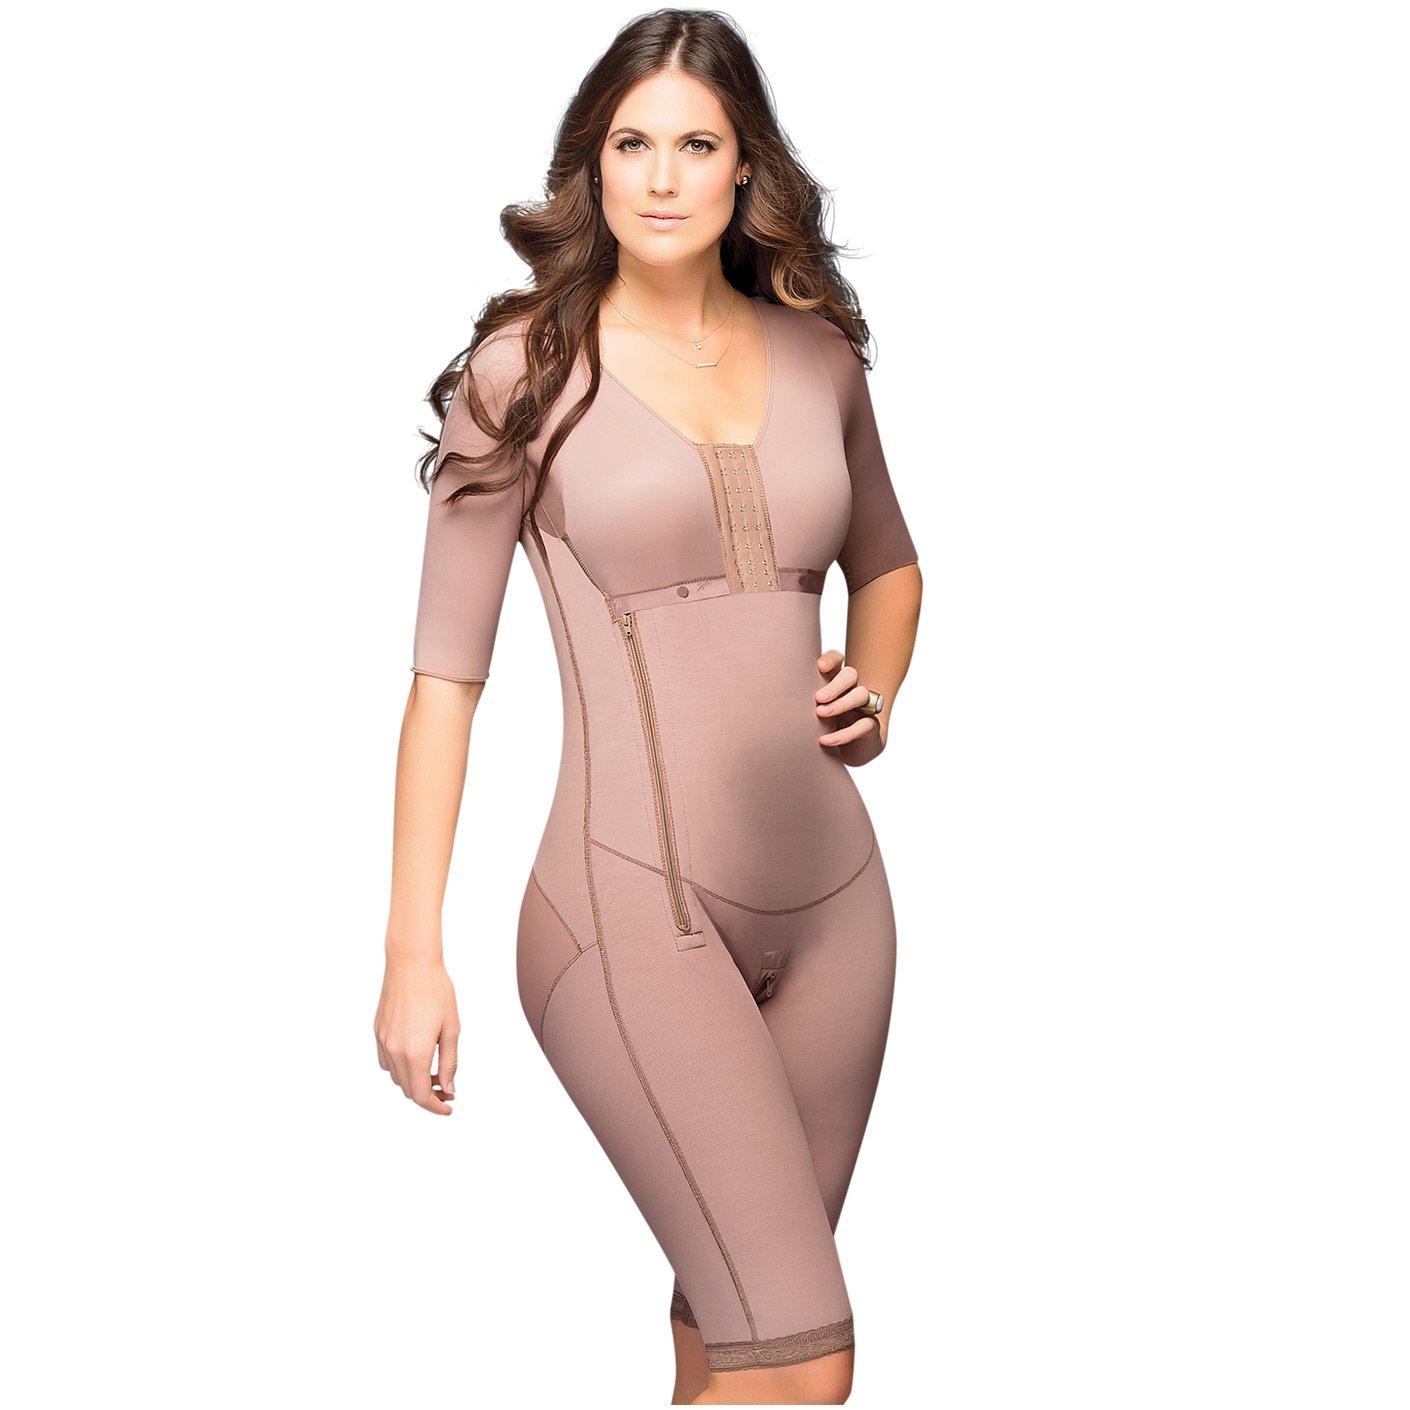 Fajas DPrada 008 Full Body Shaper Liposuction Compression Garments Post Surgery - Cocoa-Optic - M by FAJAS DISENOS D'PRADA